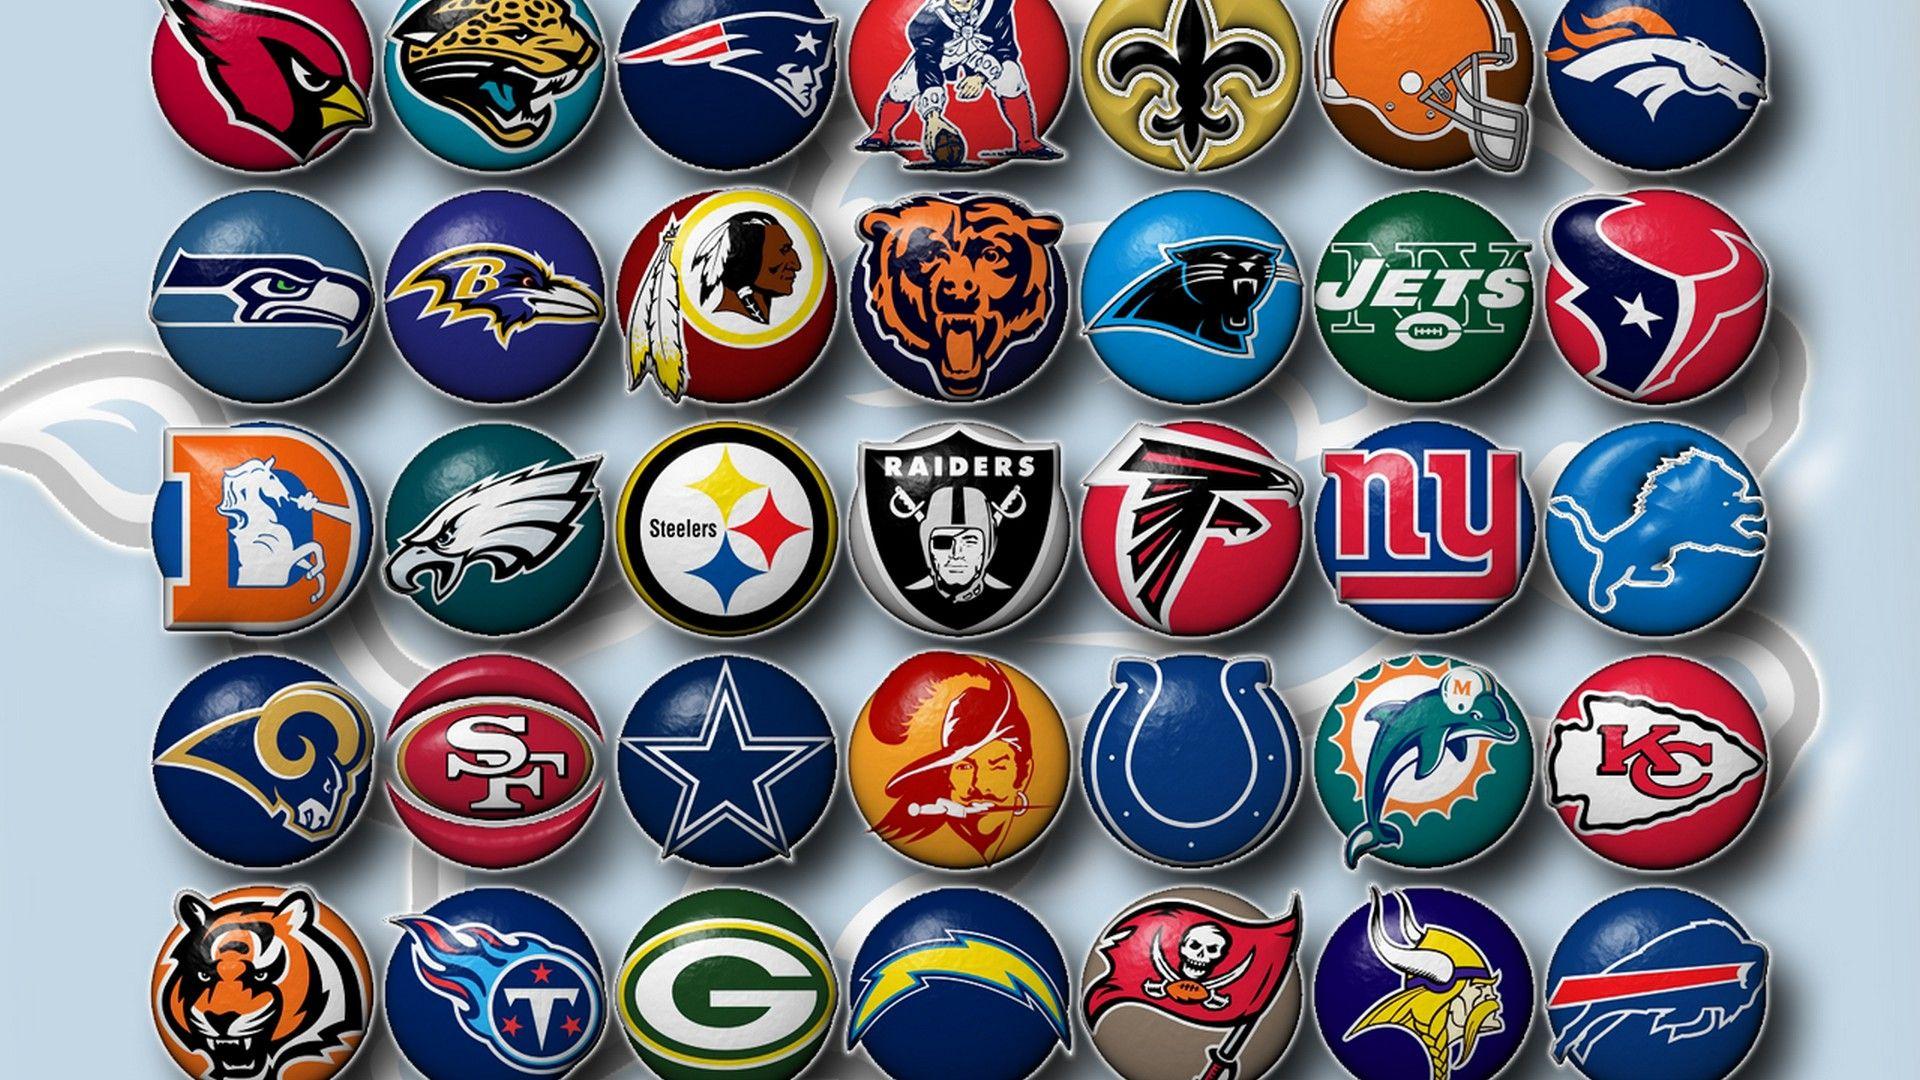 Nfl For Pc Wallpaper Nfl Uniforms Nfl Football Teams Nfl Logo